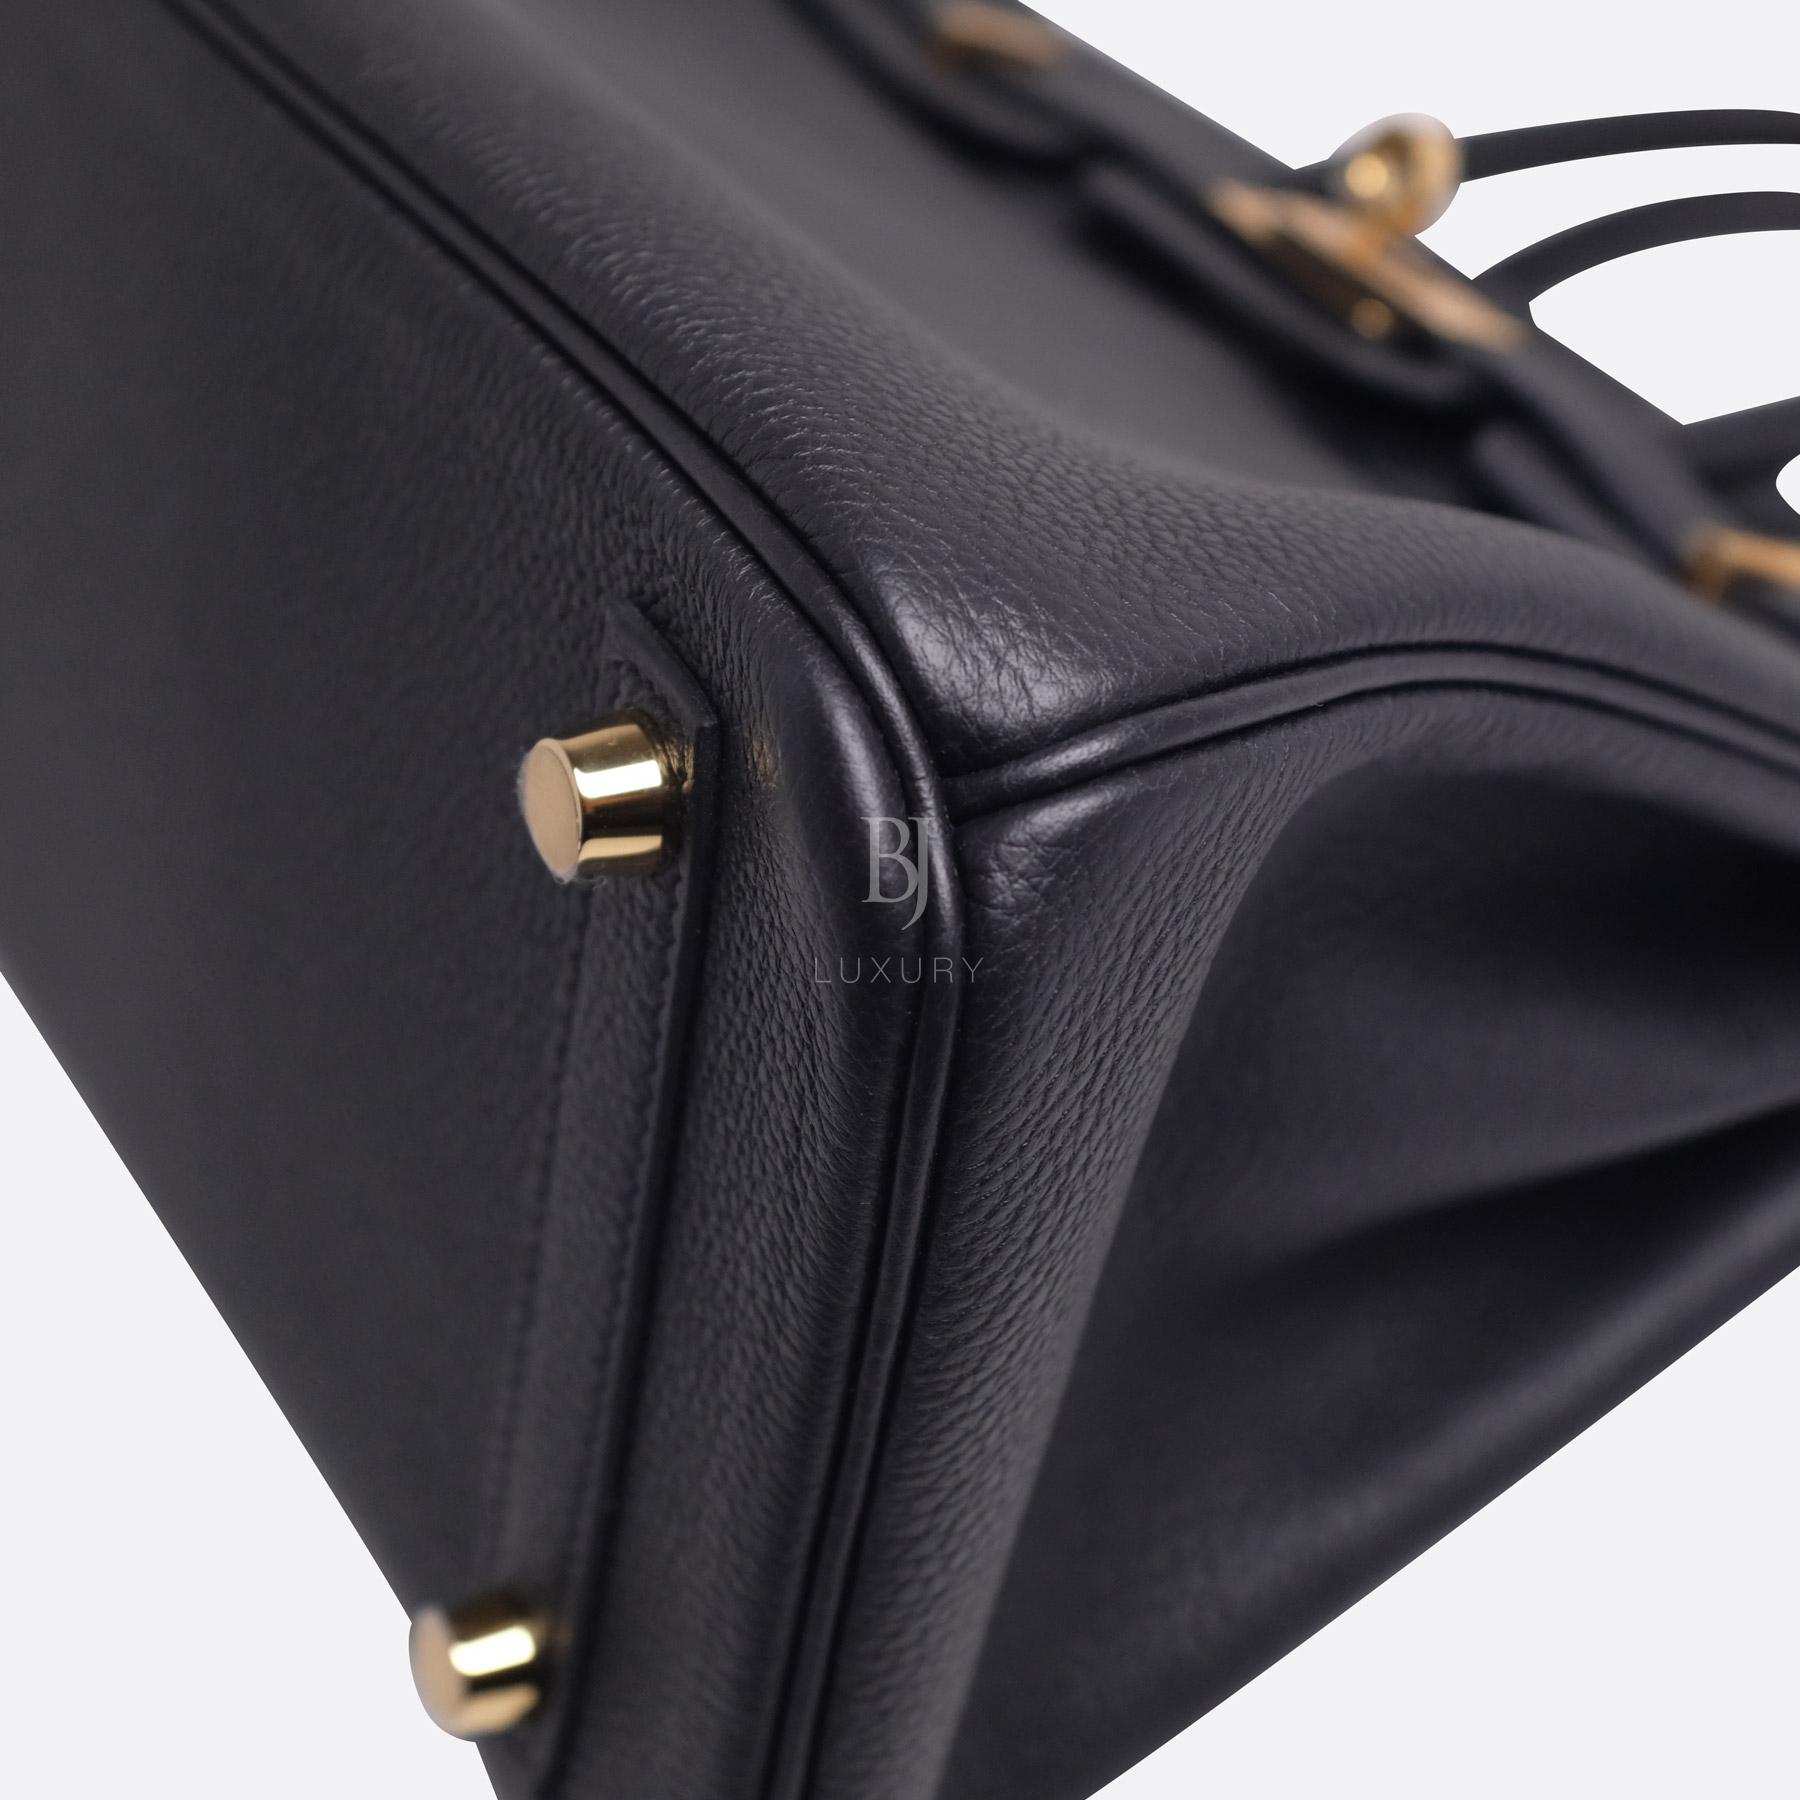 Hermes Birkin 25 Black Togo Gold Hardware BJ Luxury 15.jpg